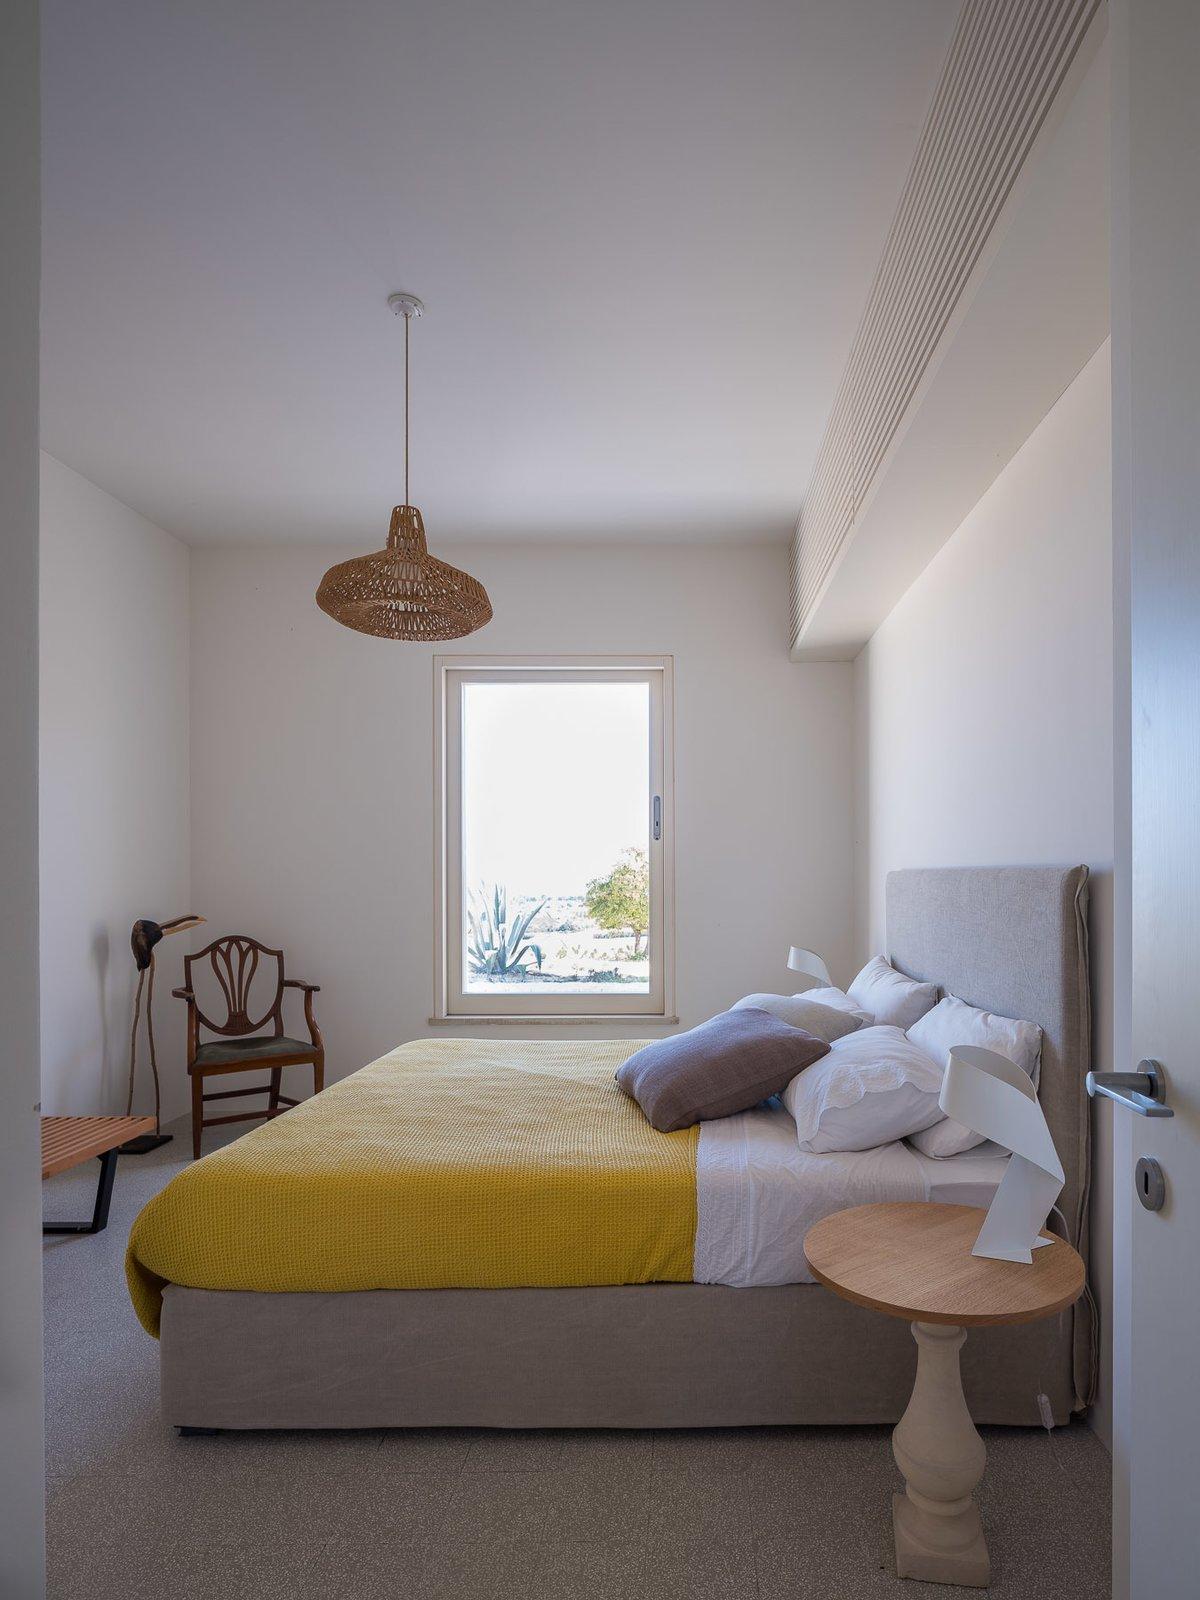 Bedroom, Chair, and Pendant Lighting Double bedroom  Cozzo Coniglio